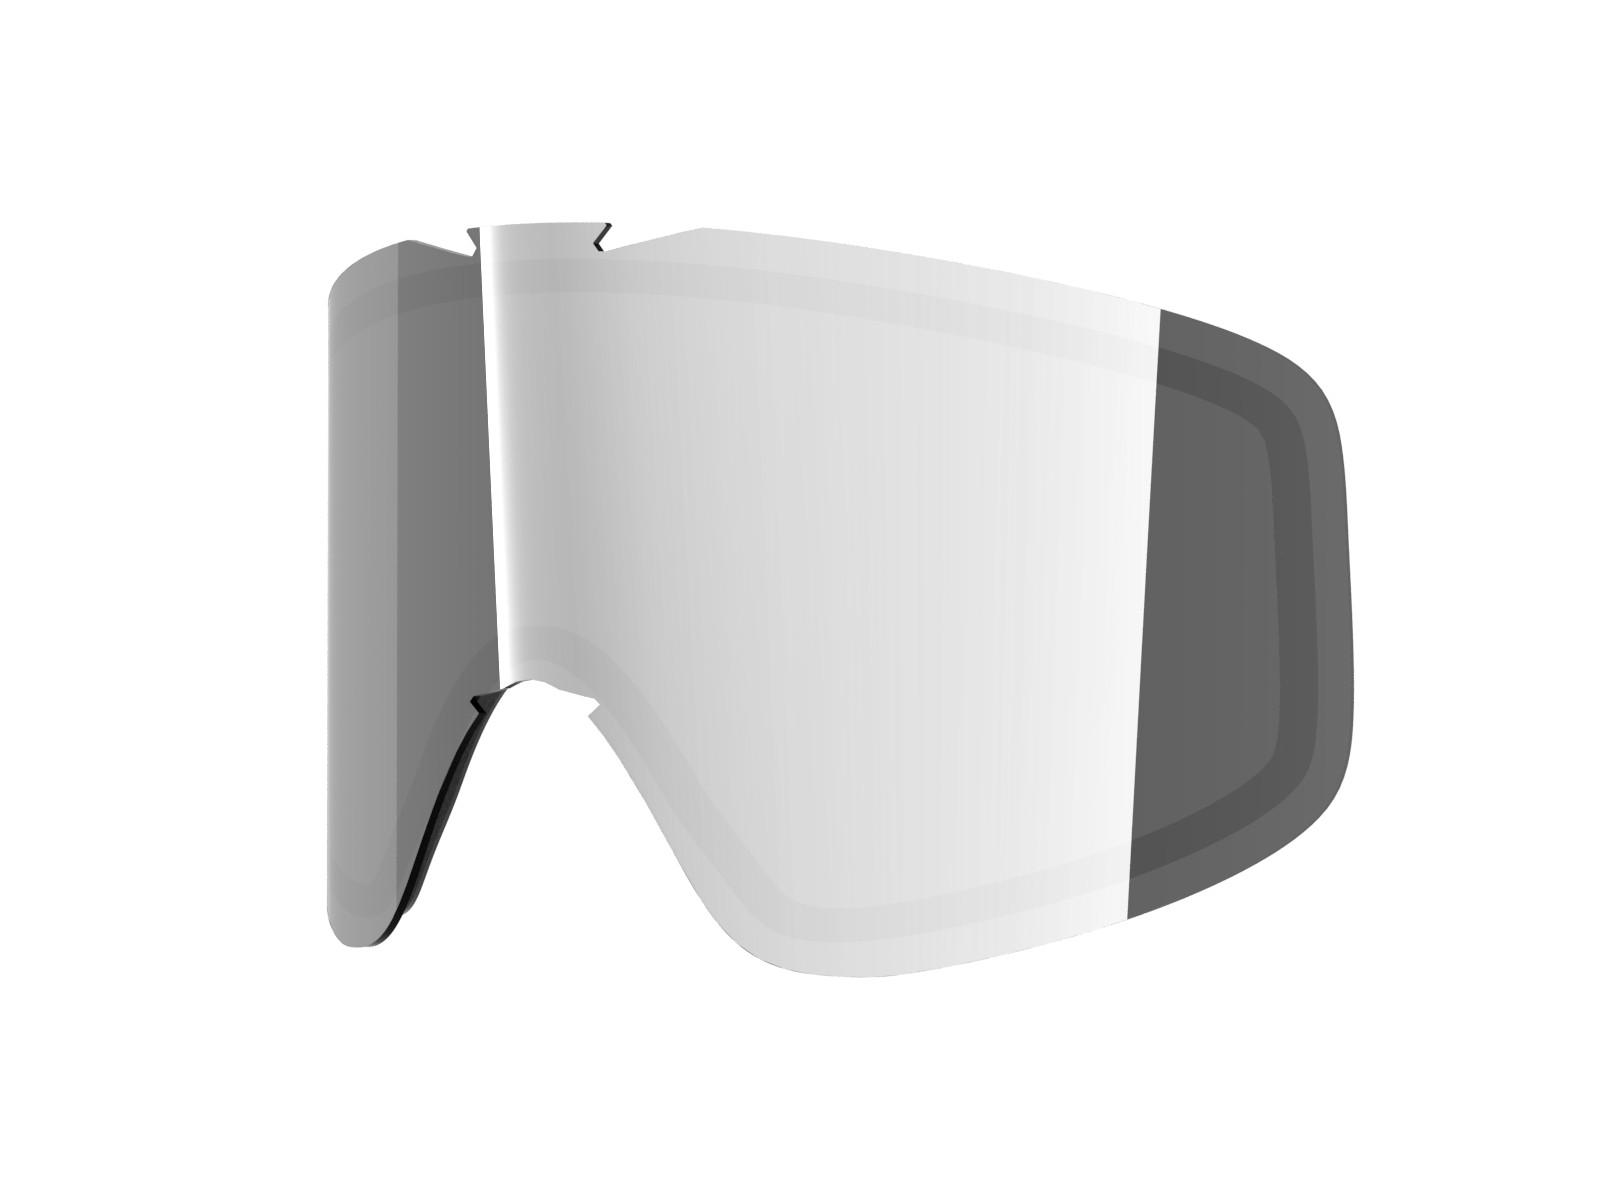 Silver lens for Lente per Flat goggle